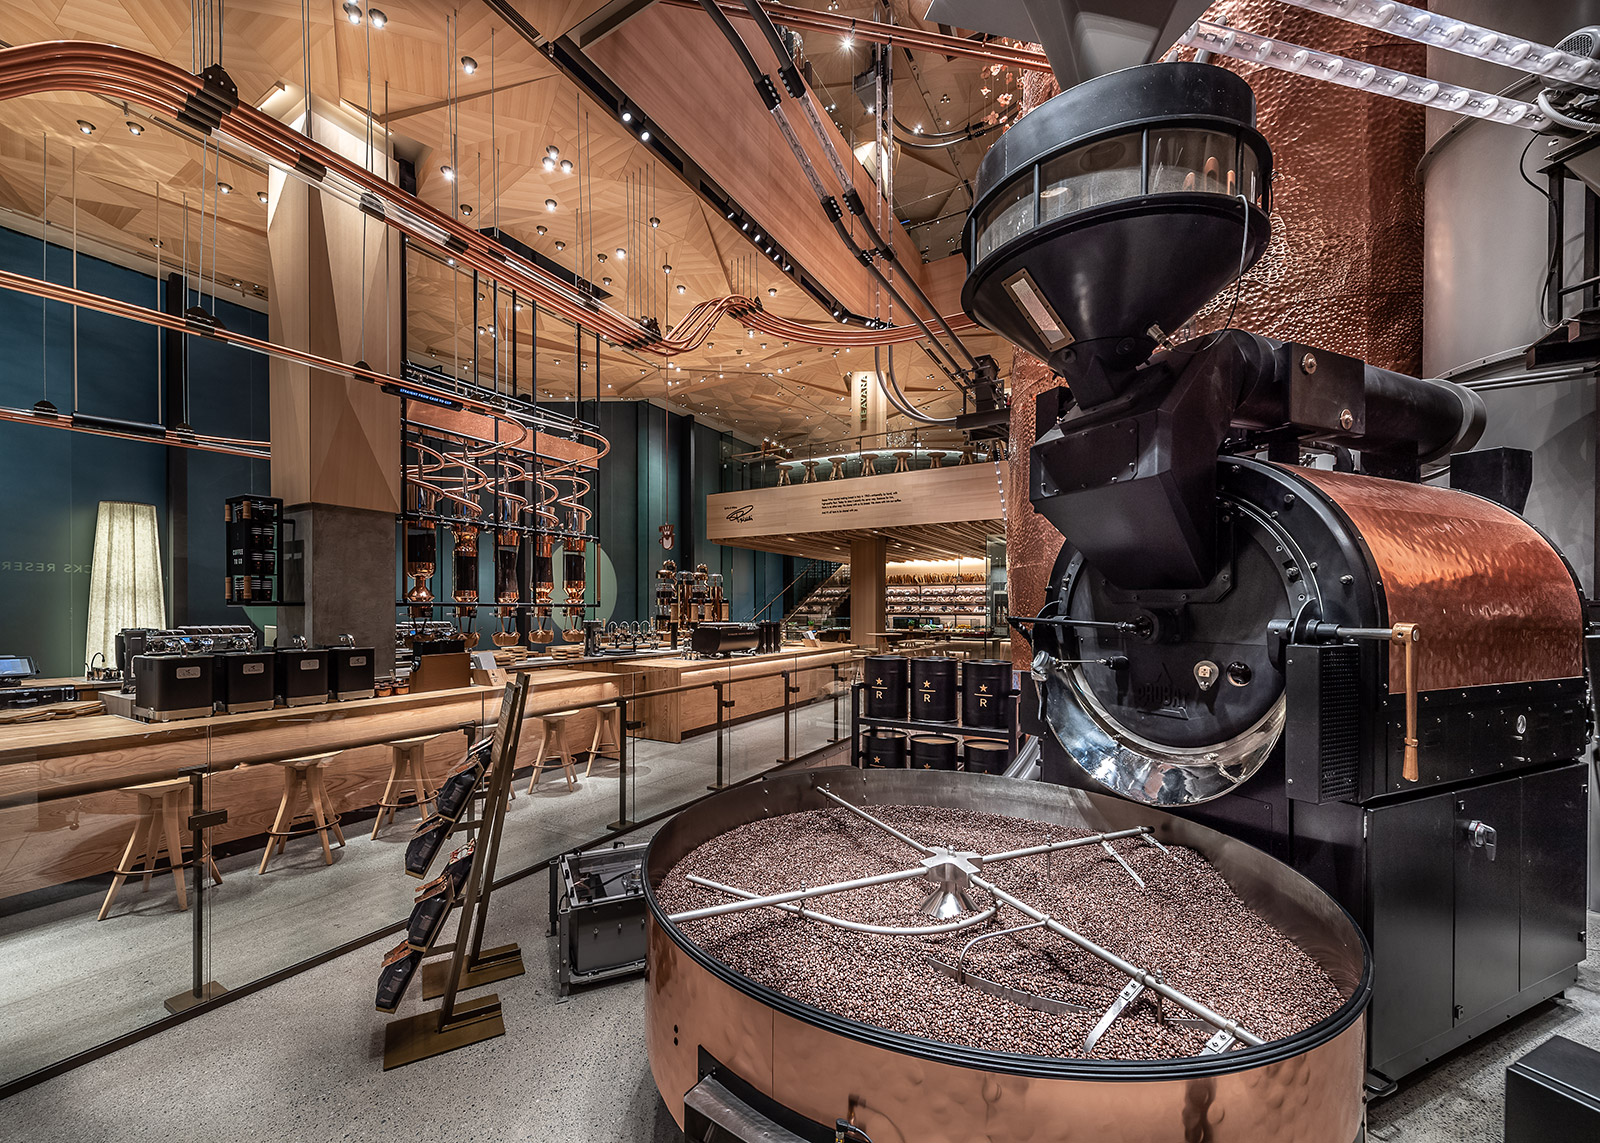 Starbucks' Kengo Kuma-designed Reserve Roastery opens in Tokyo